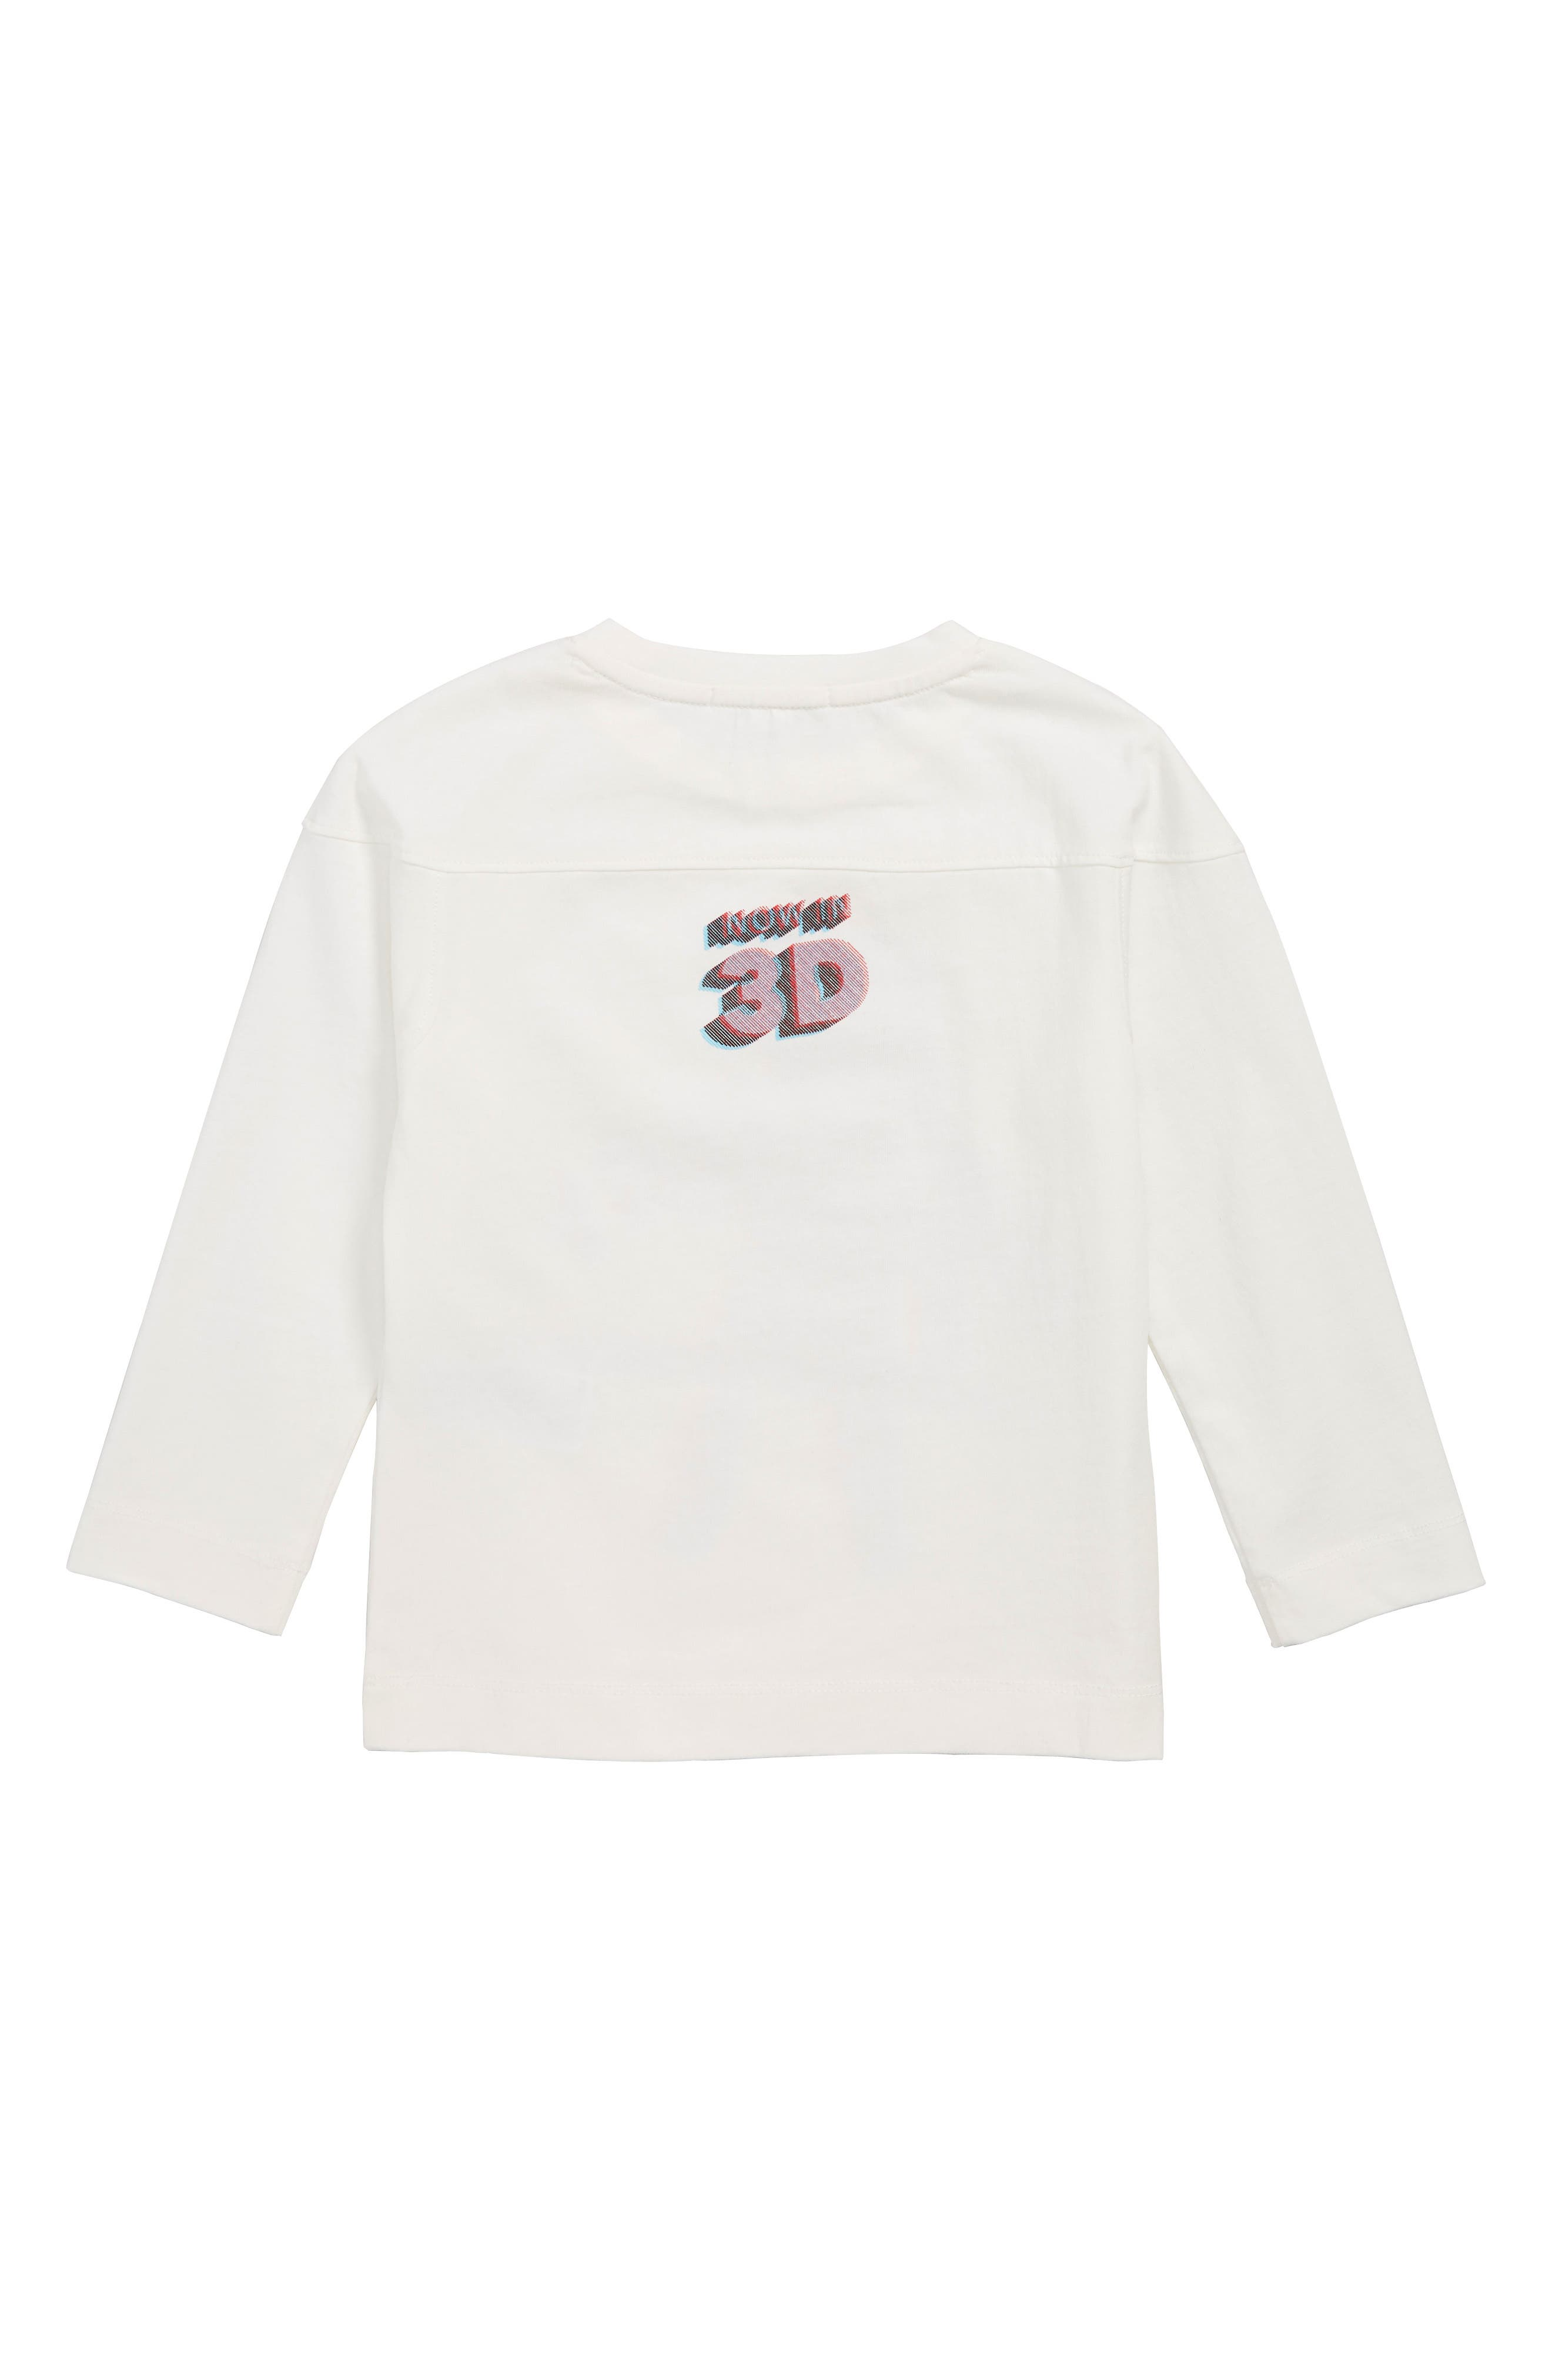 3D Spaceman Graphic T-Shirt,                             Alternate thumbnail 2, color,                             WHITE